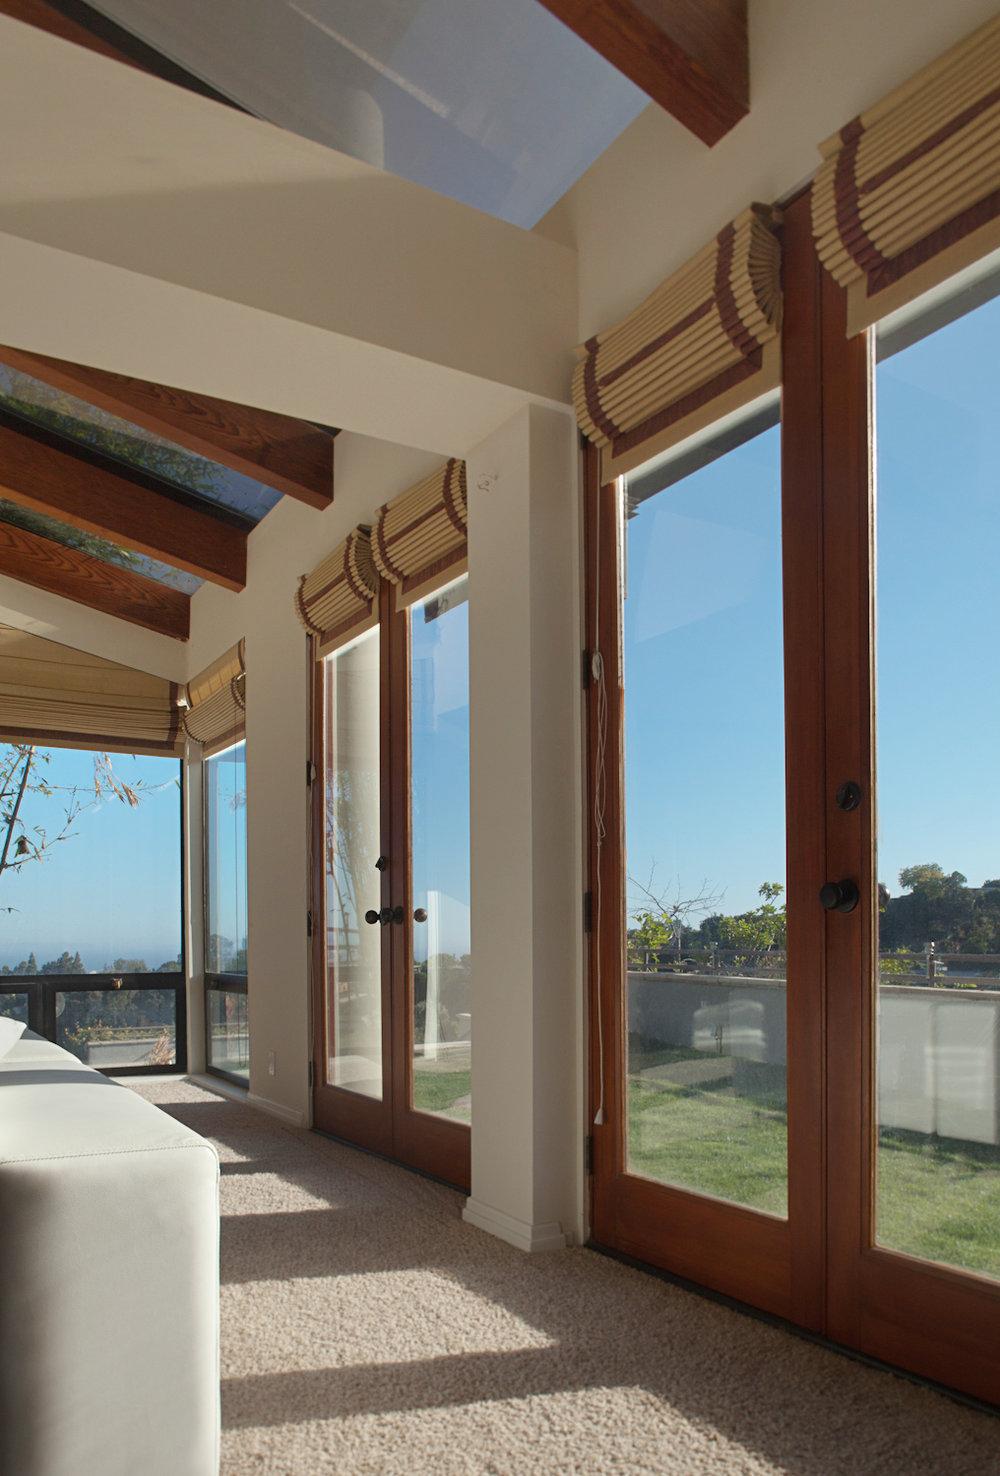 01_Architecture-real-estate-photographer-f1136919015b.jpg